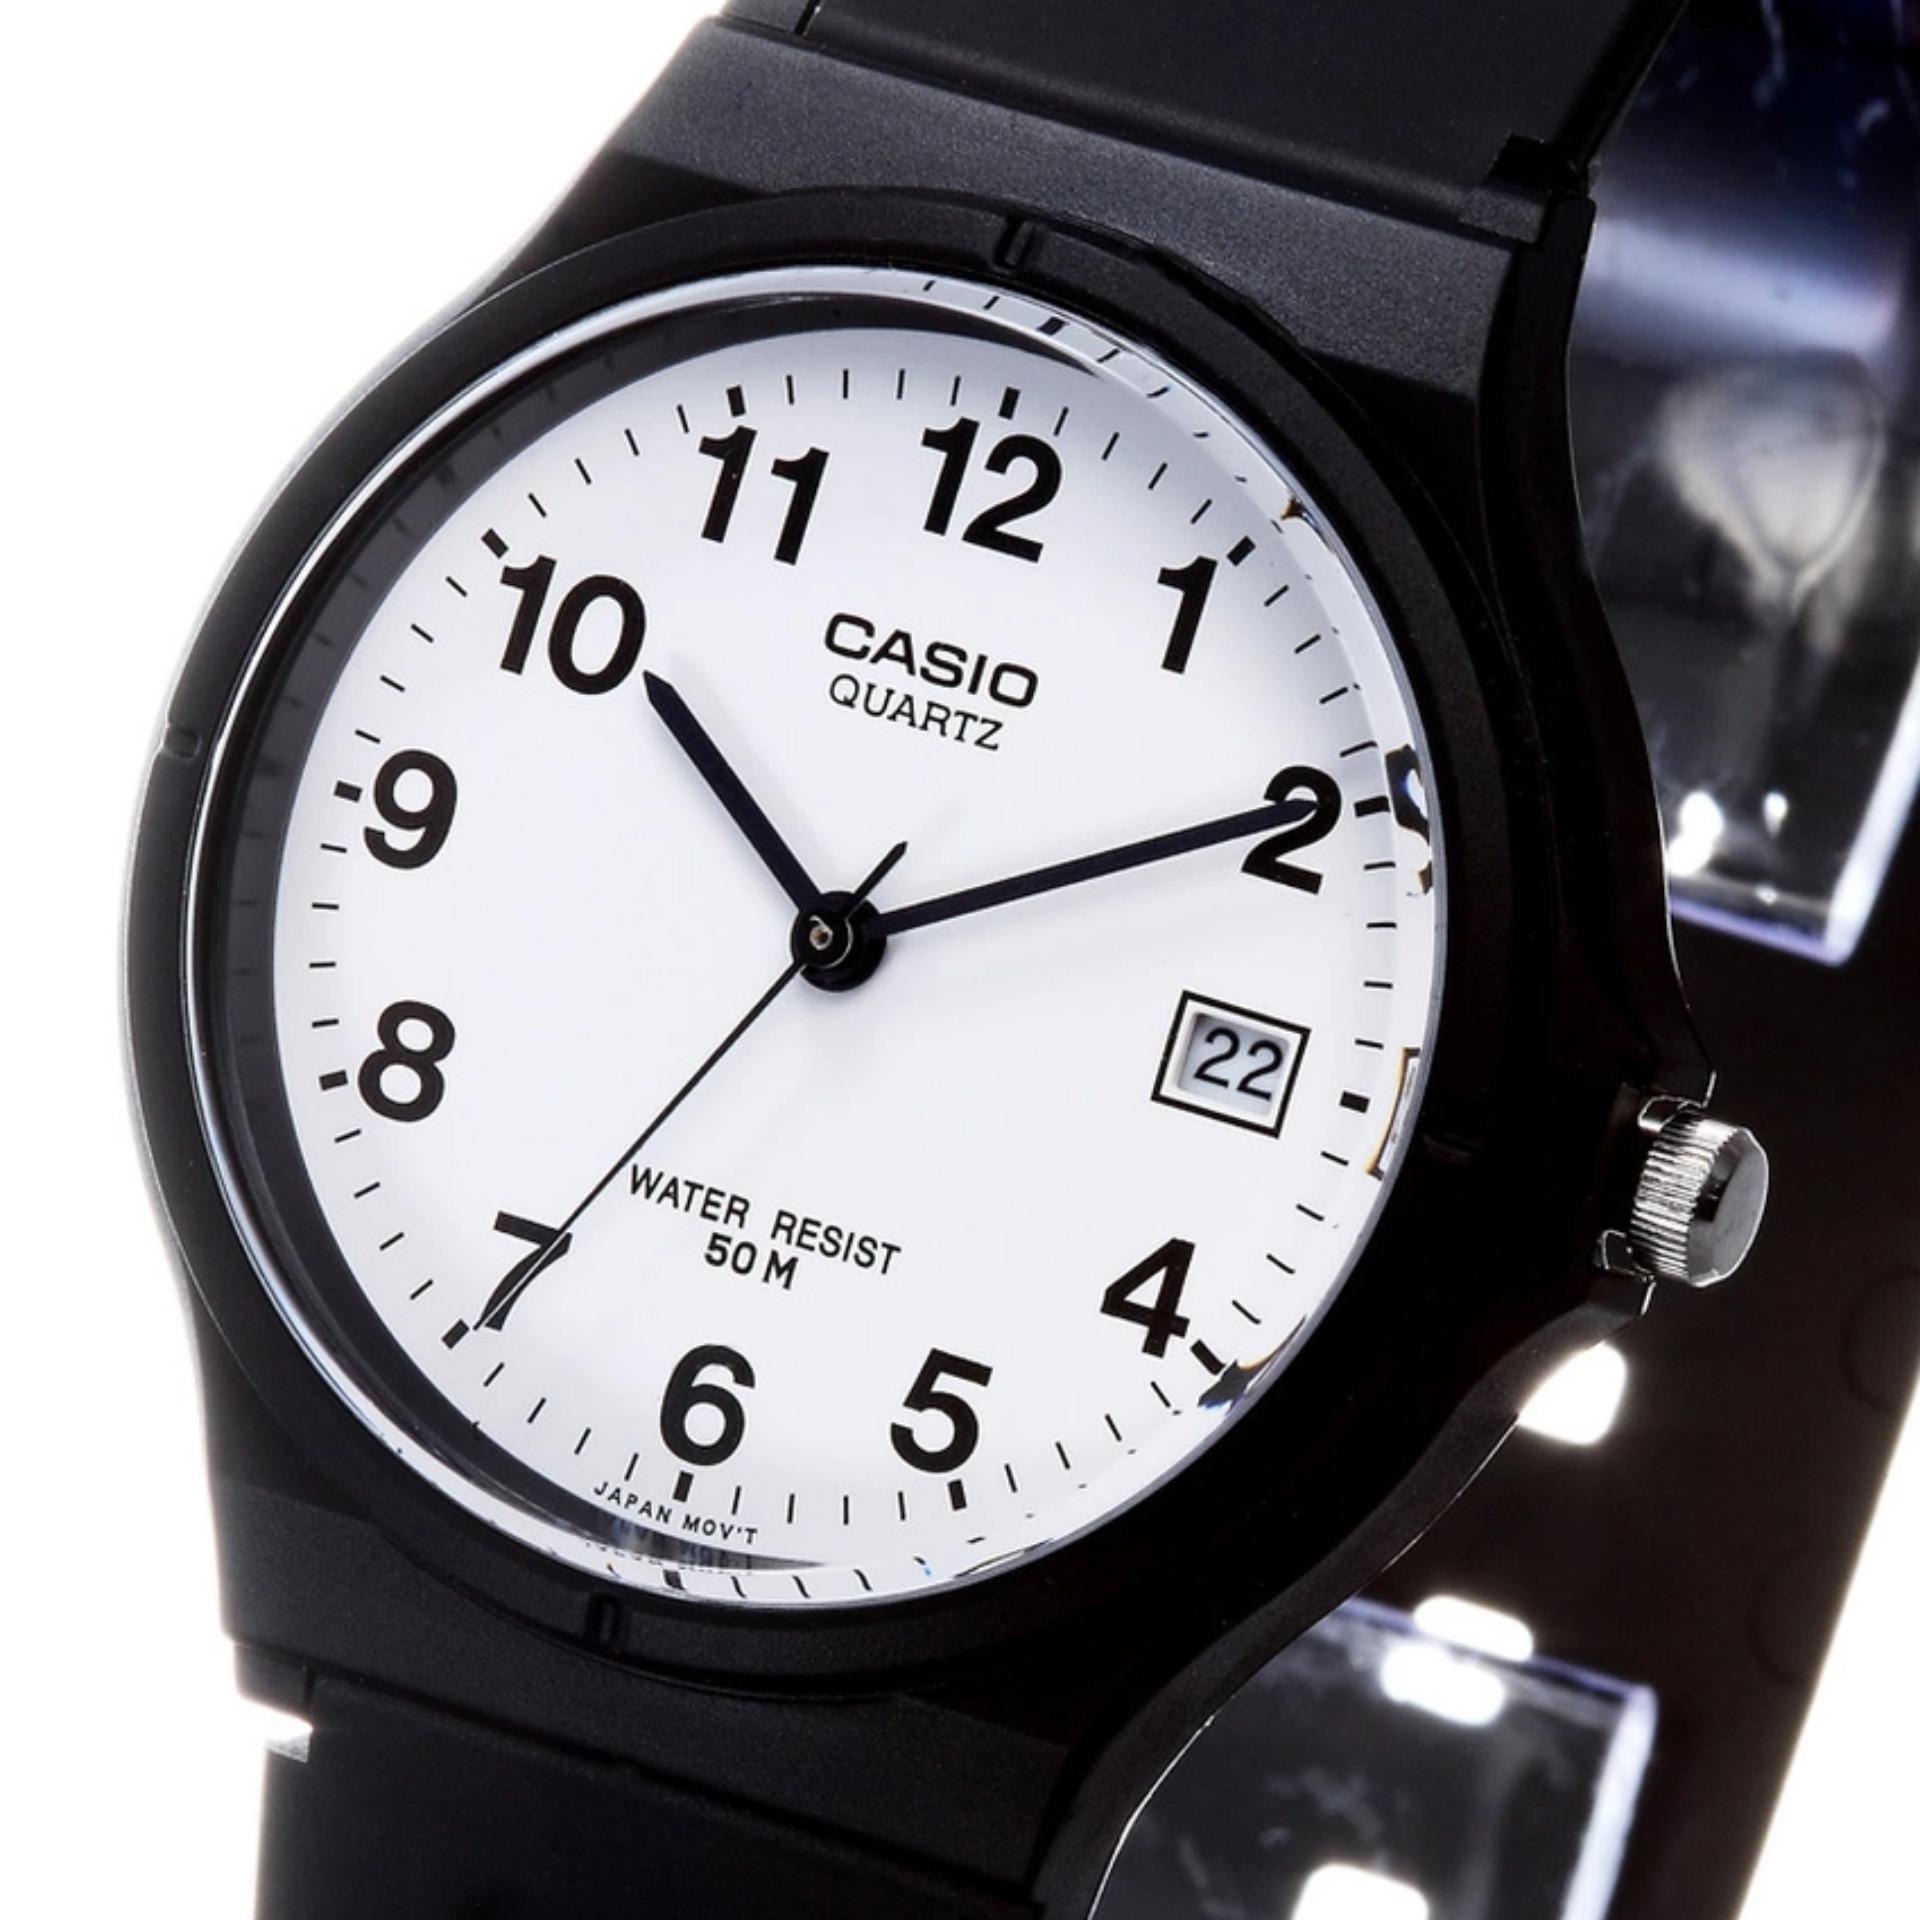 Casio Mw 240 1b2vdf Jam Tangan Pria Hitam Kuning Karet Daftar Standard 3b Black Green Strap Rubber 59 7bvdf Unisex Casual Putih